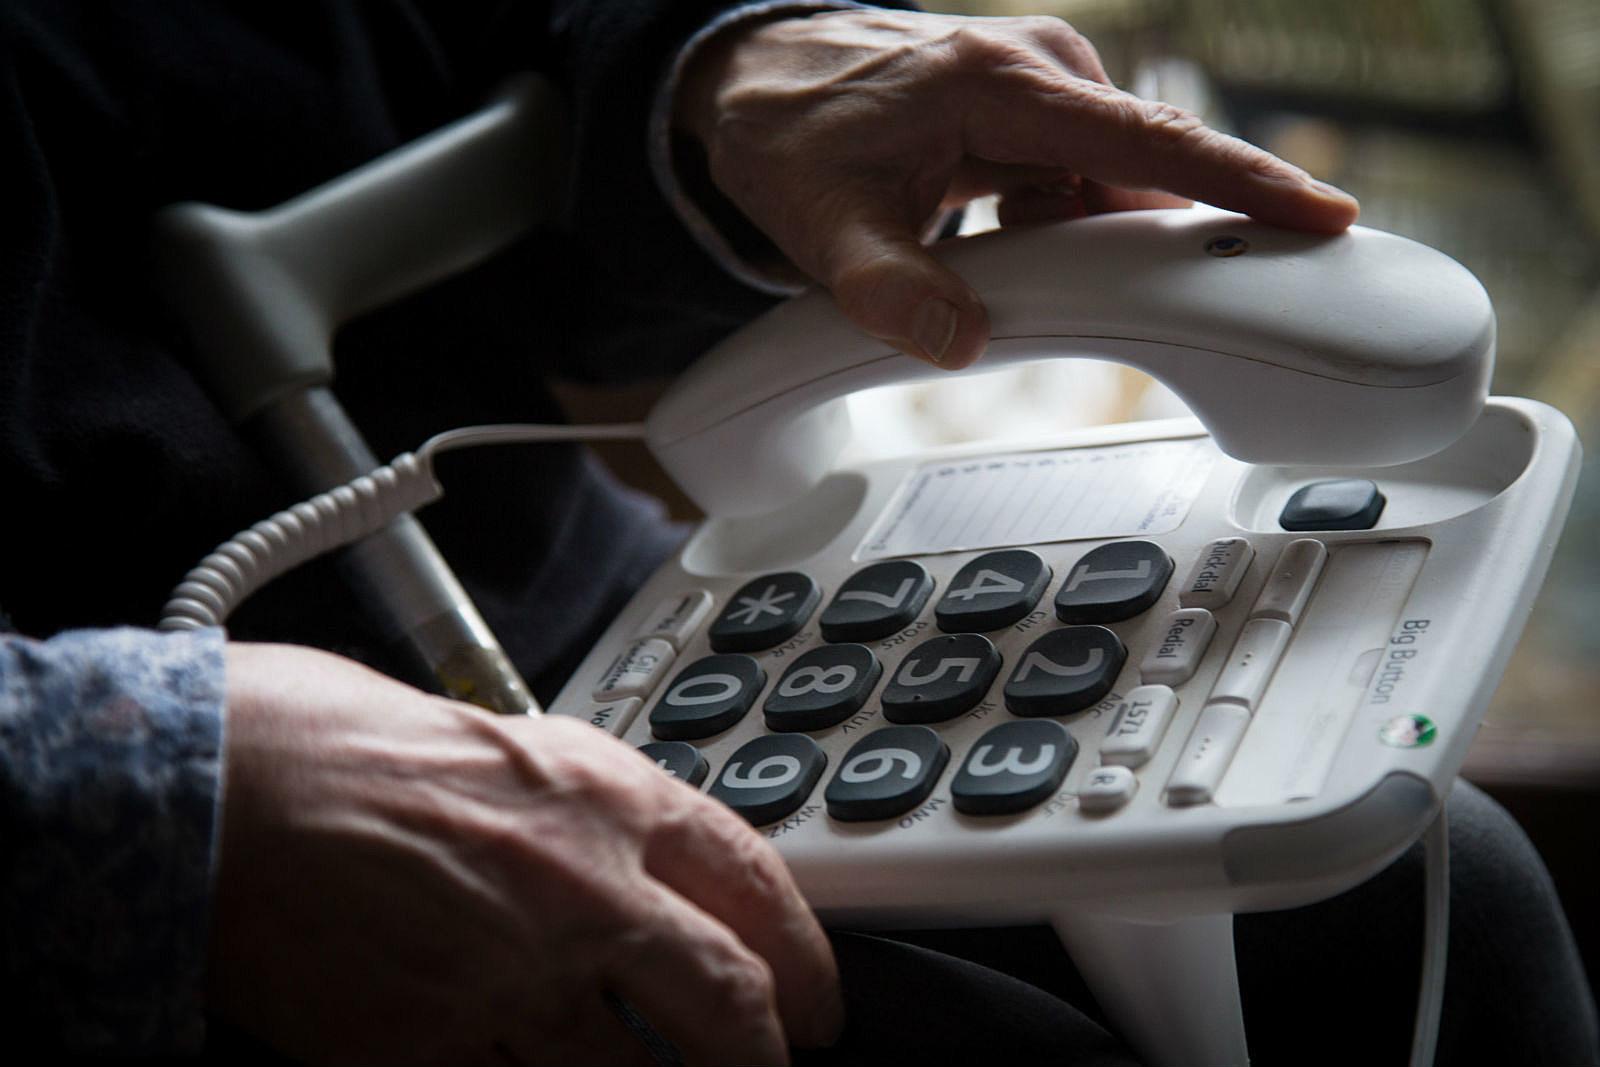 Telephone_Matt Cardy/Getty